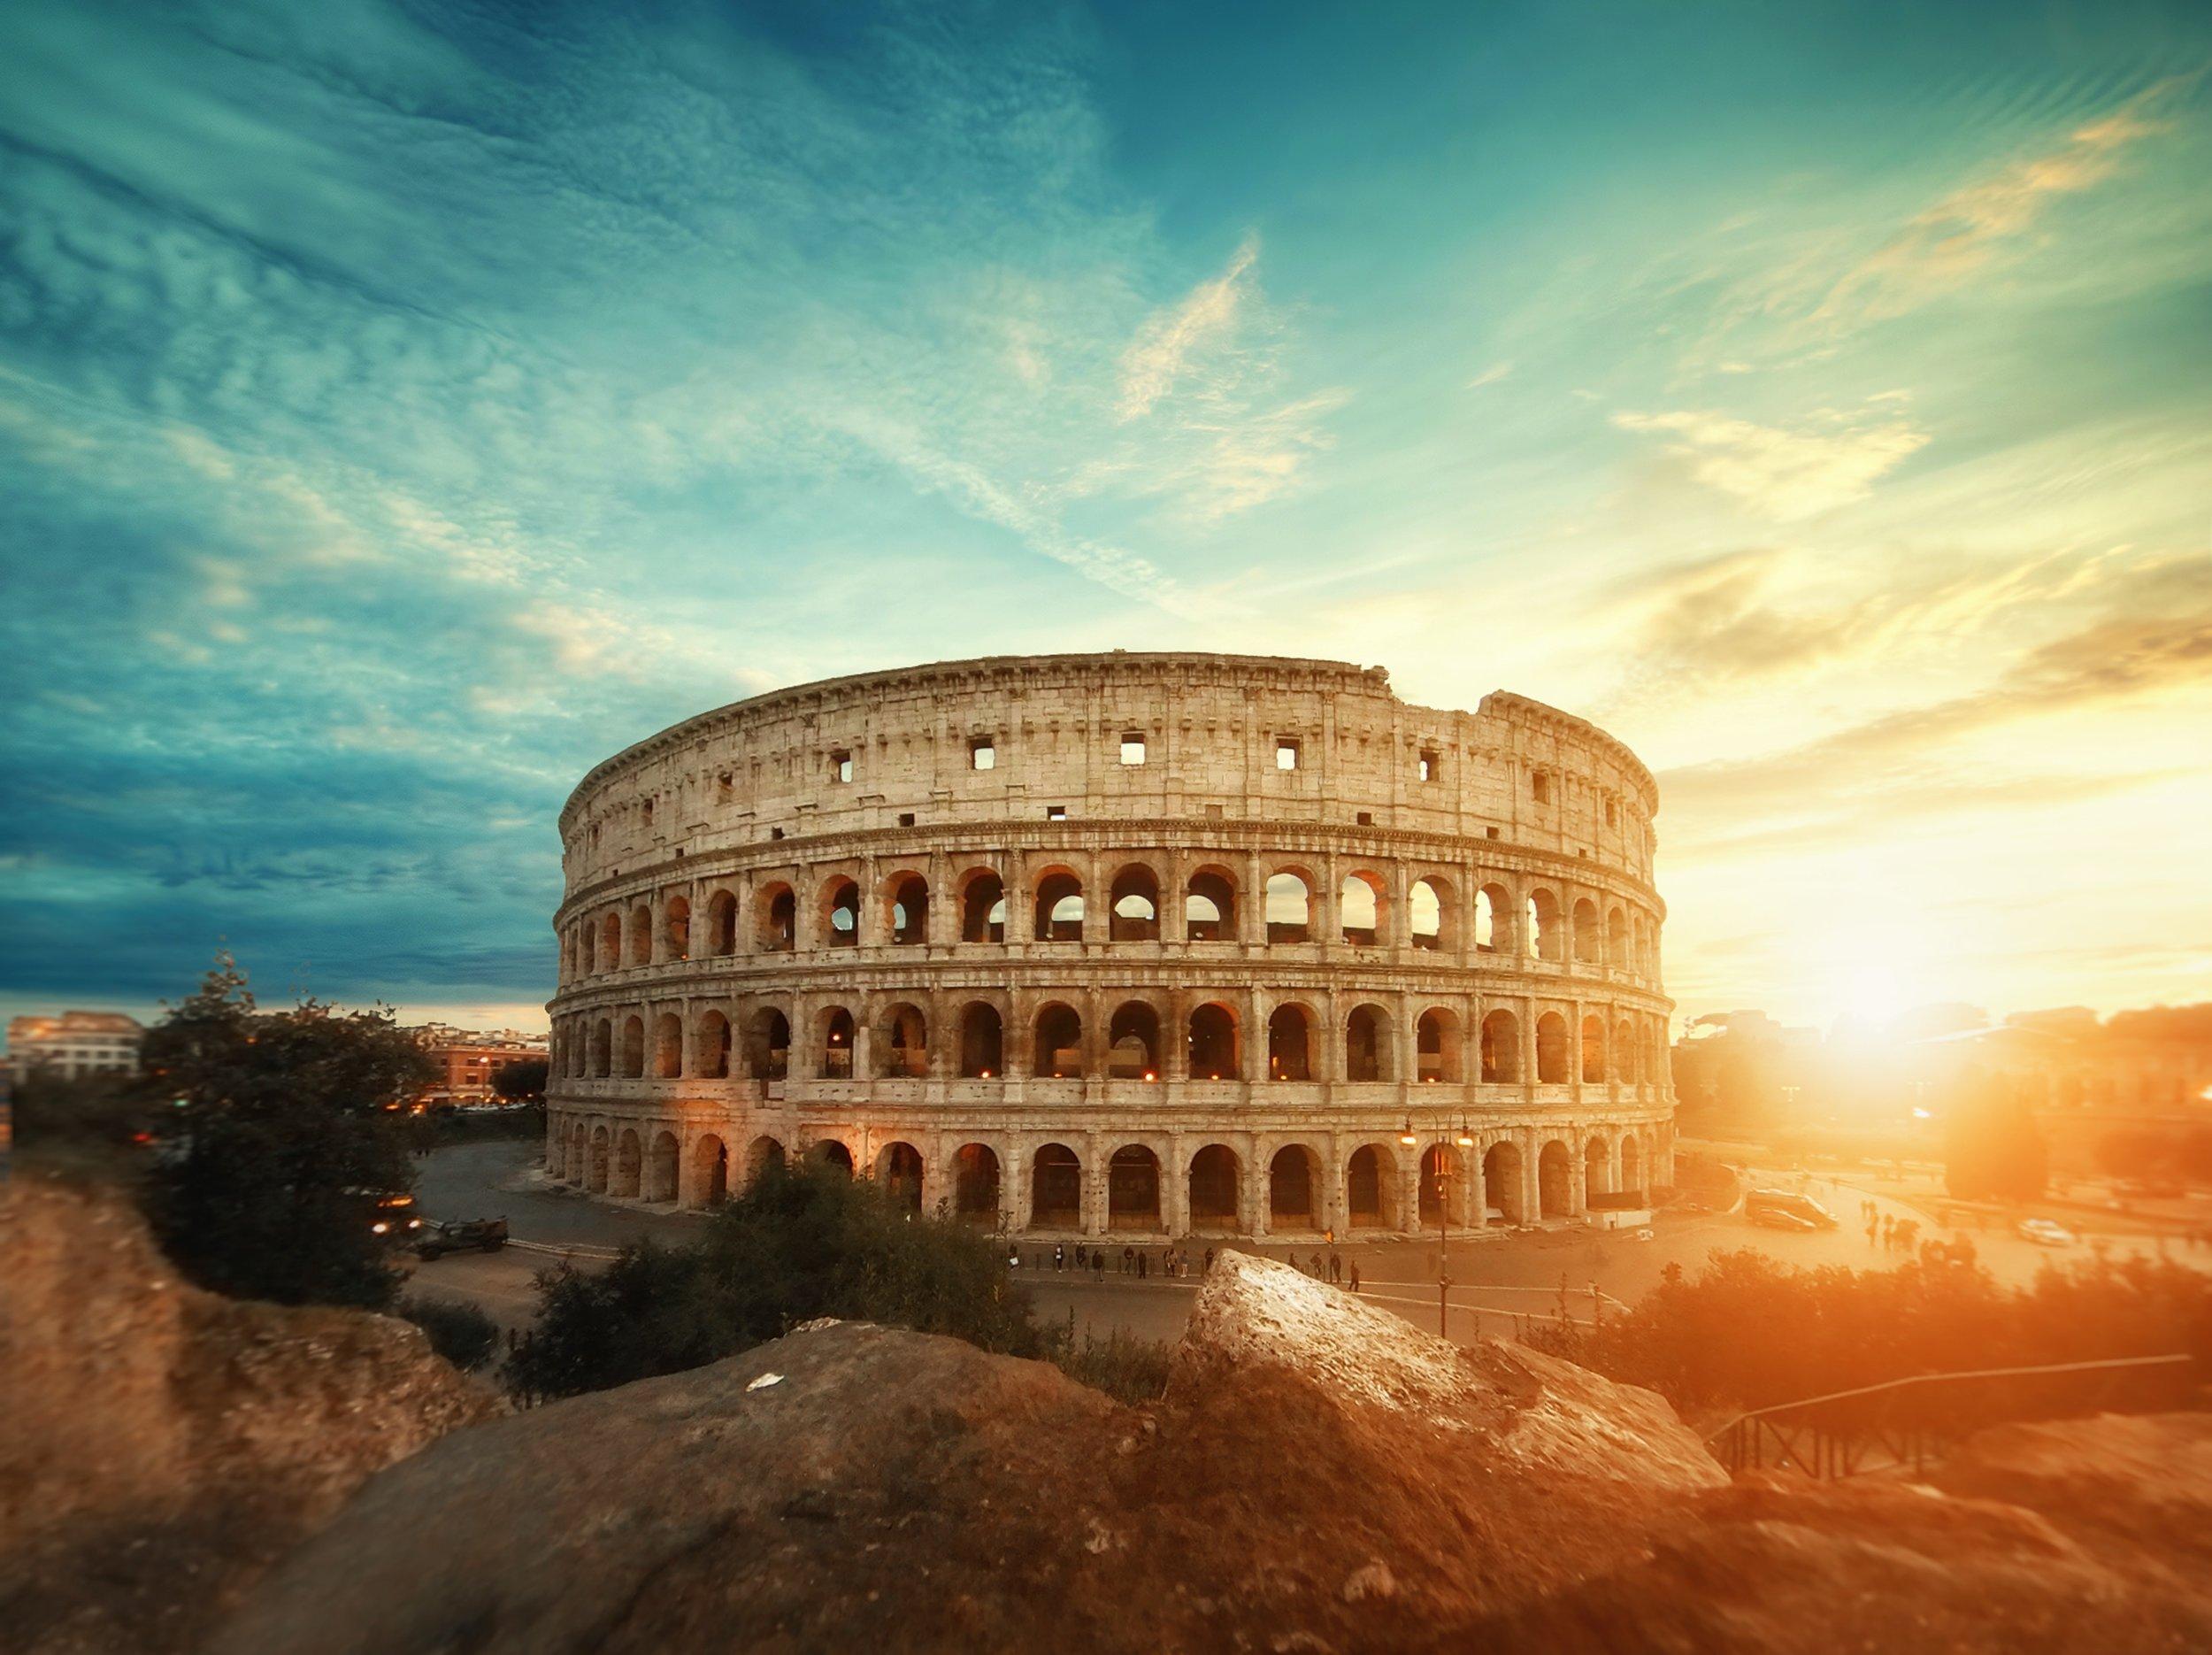 Colosseum Italy.jpg